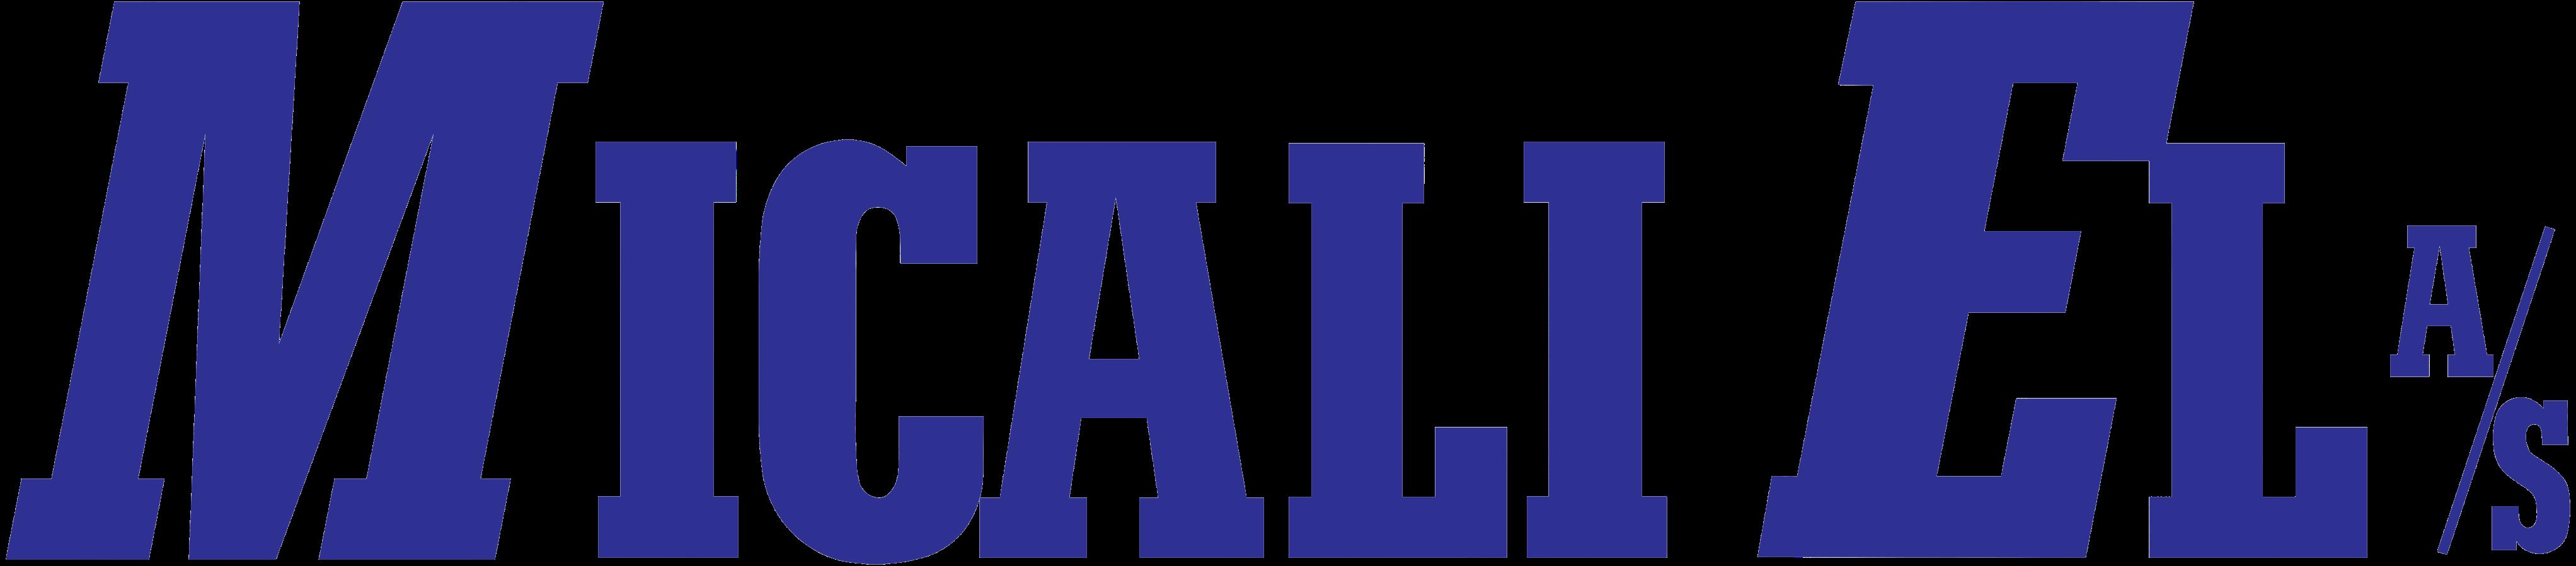 NY - Micali El